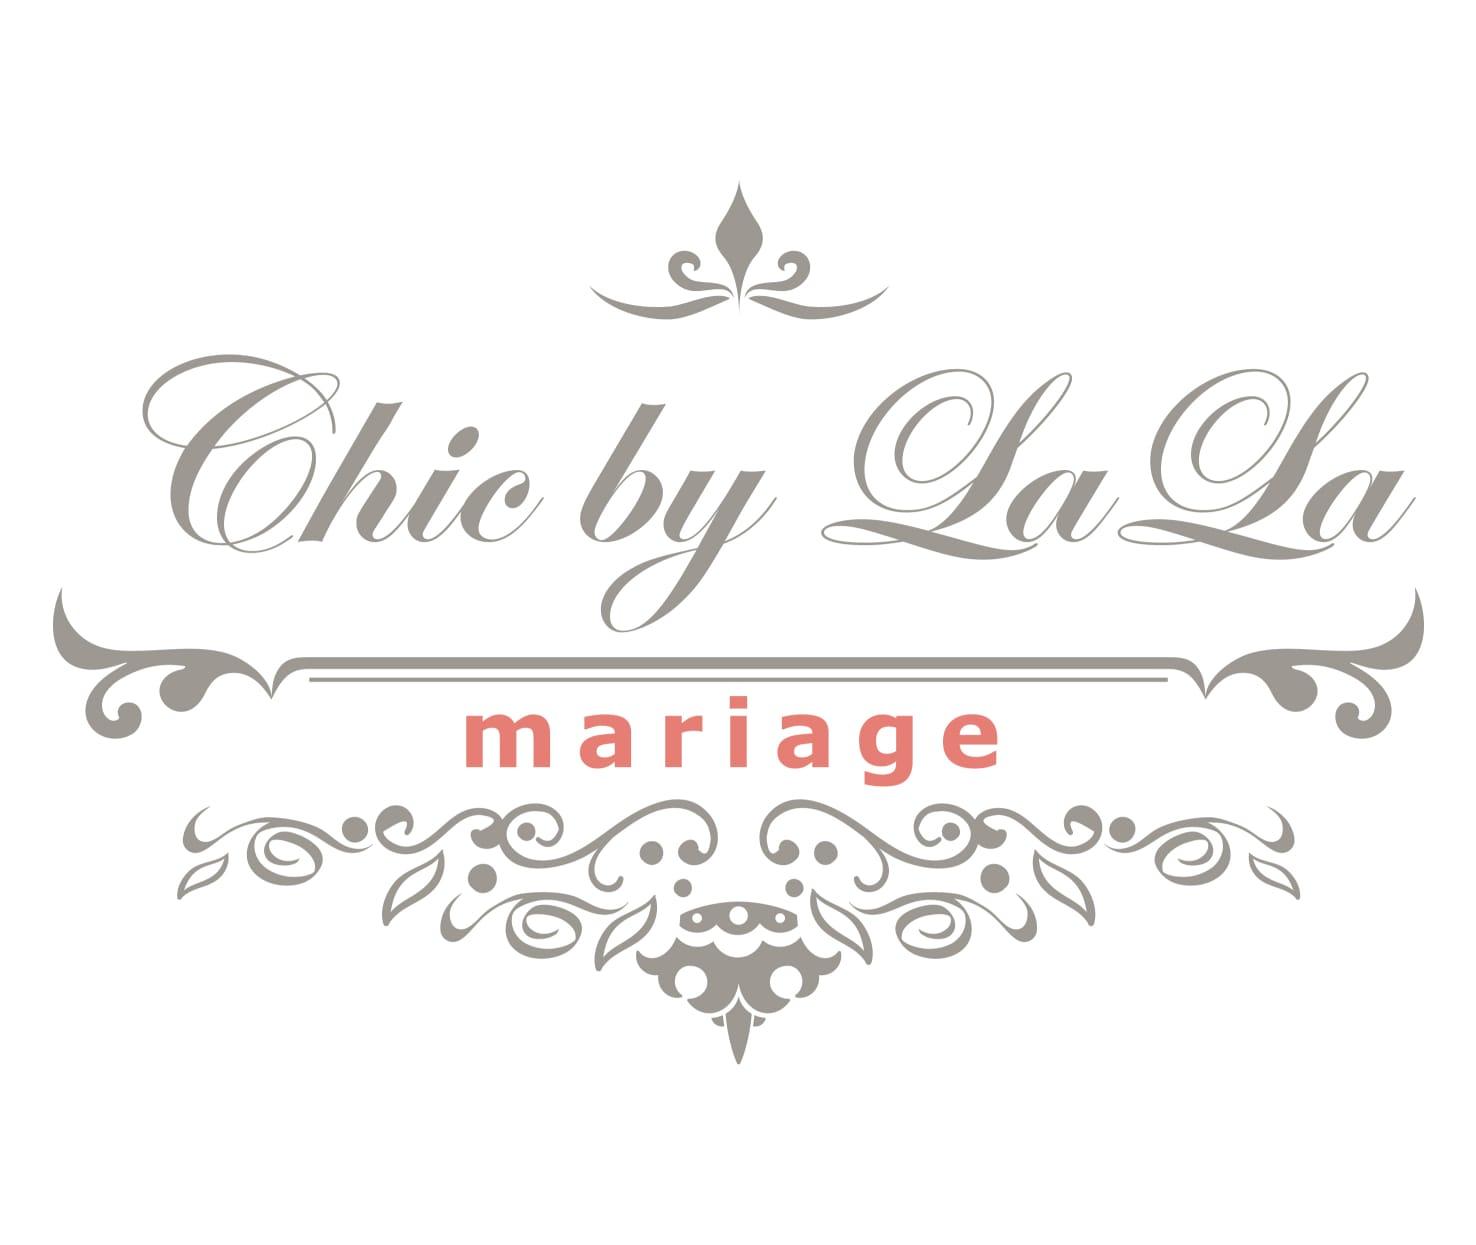 Chic by La La Timisoara